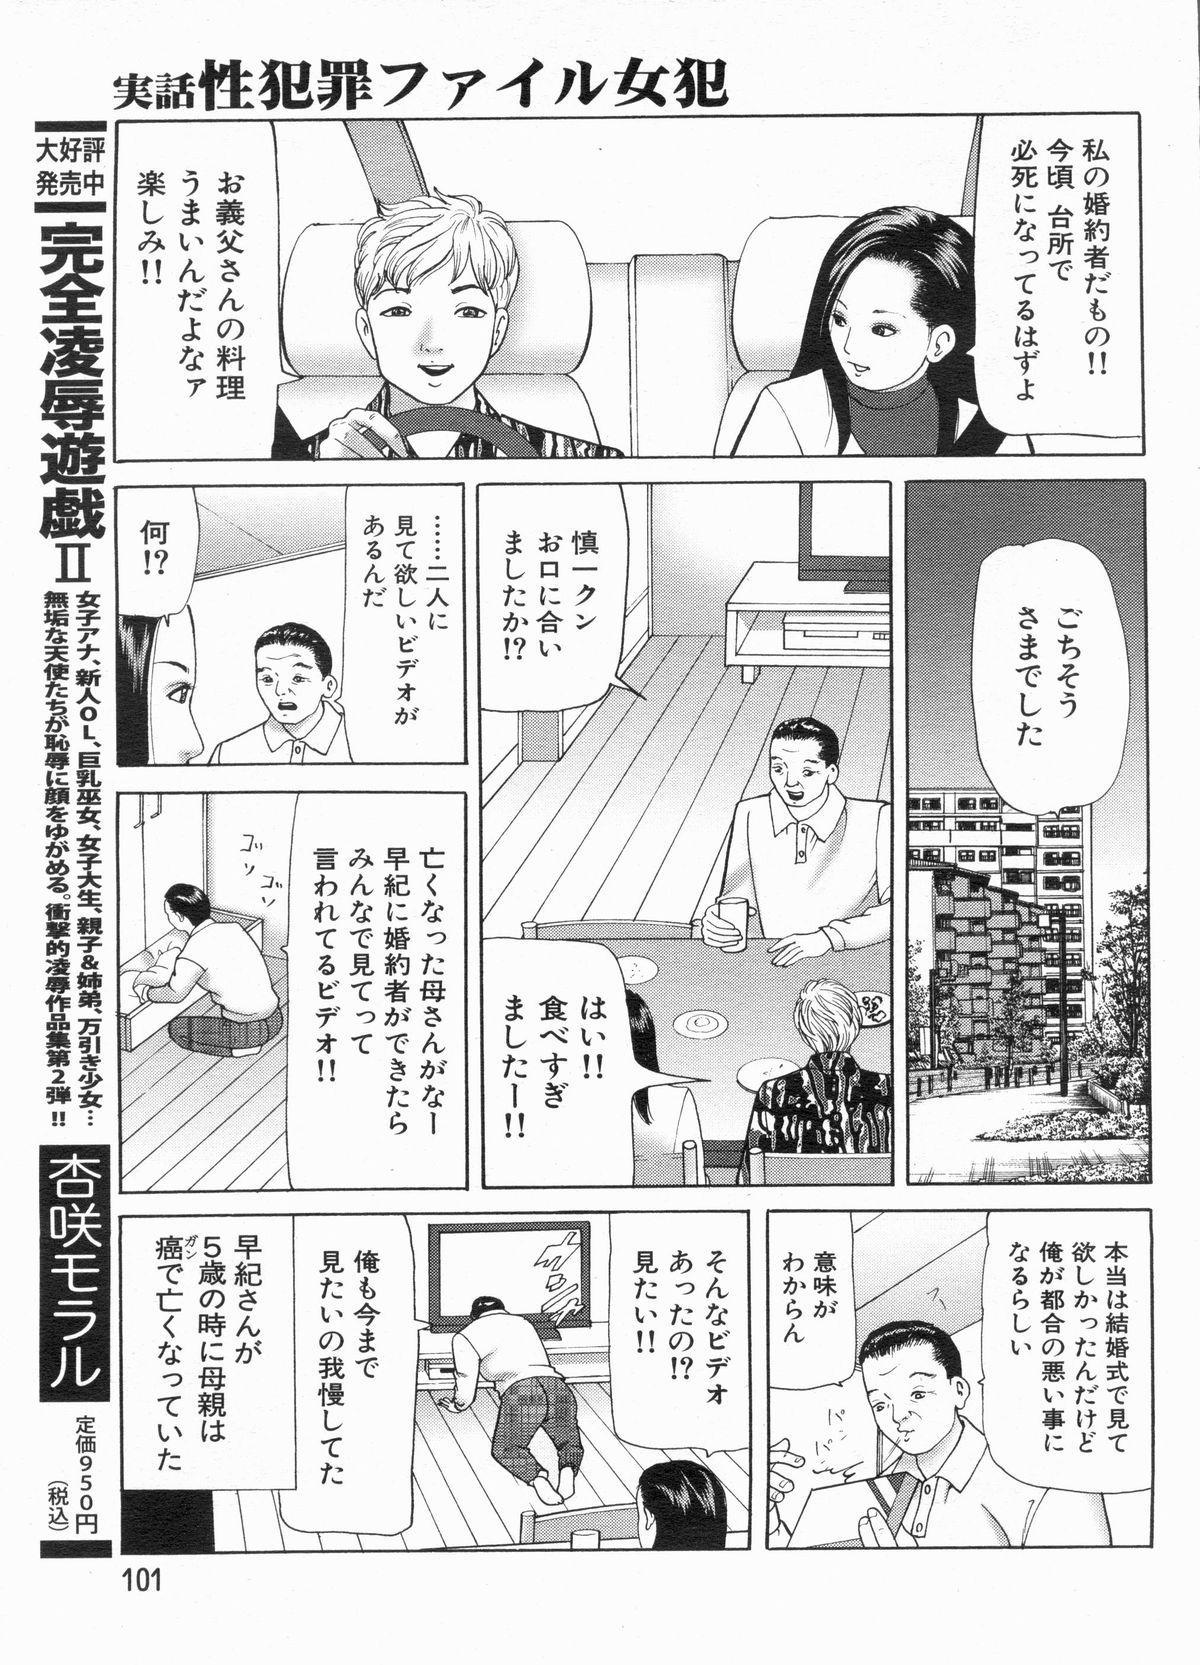 Manga Bon 2013-03 99